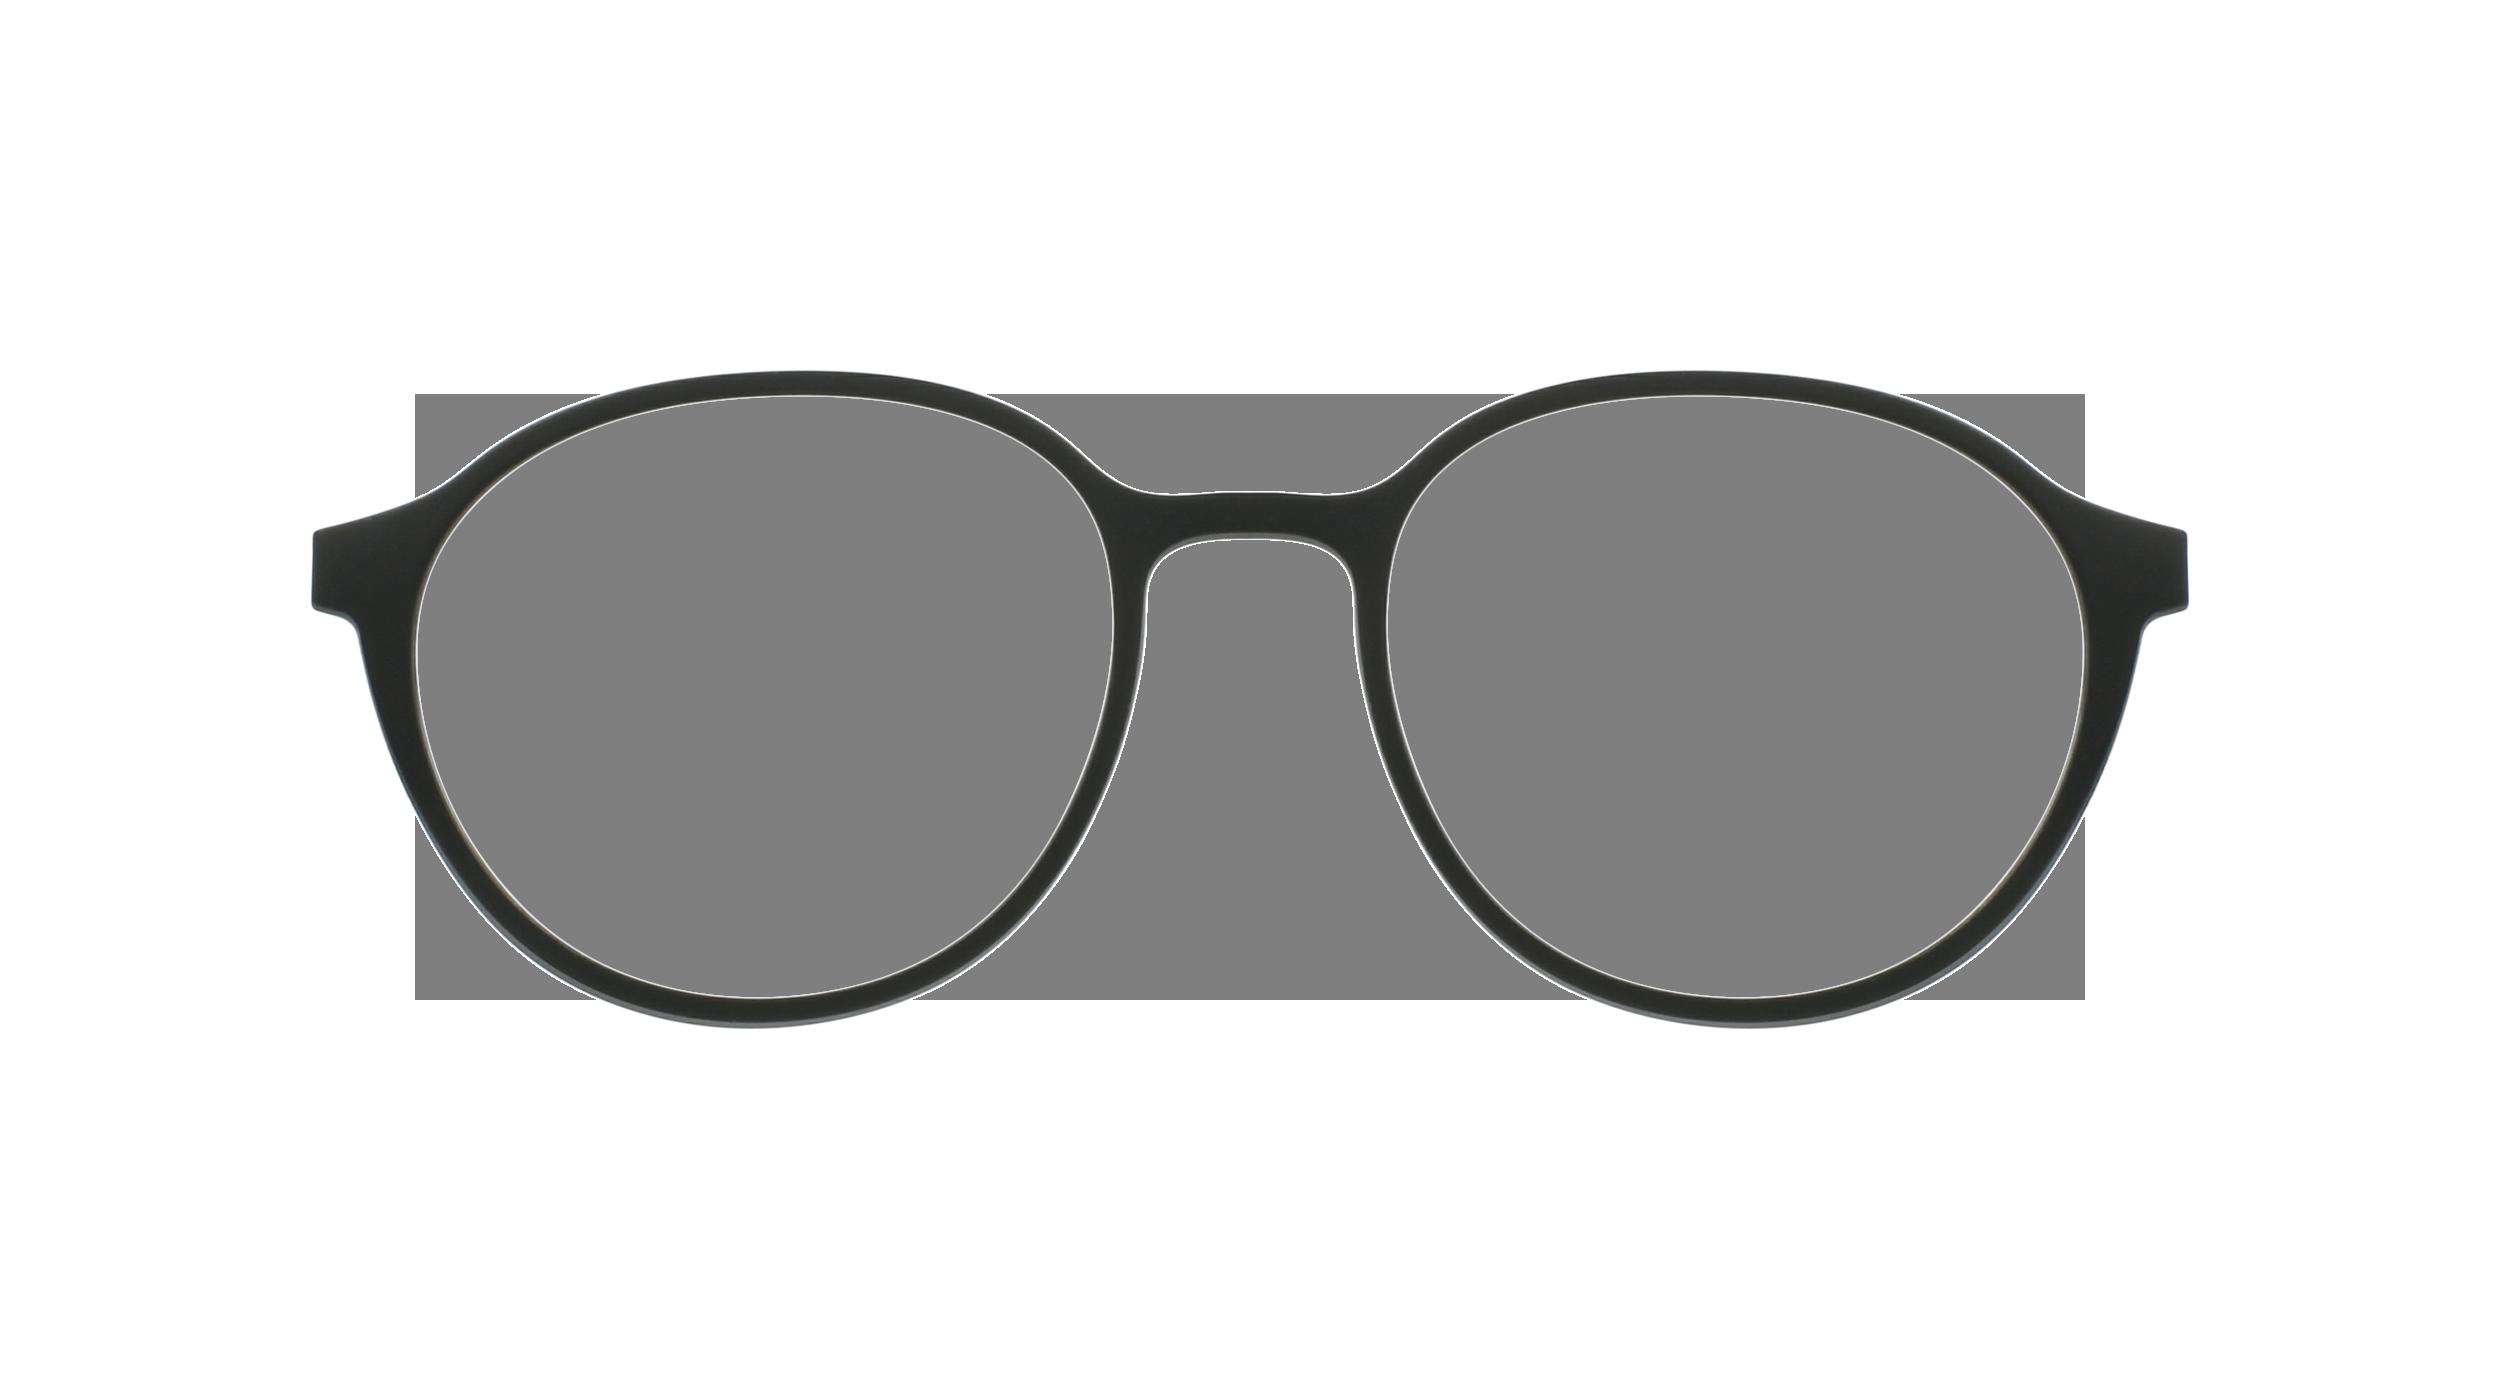 afflelou/france/products/smart_clip/clips_glasses/07630036458761.png